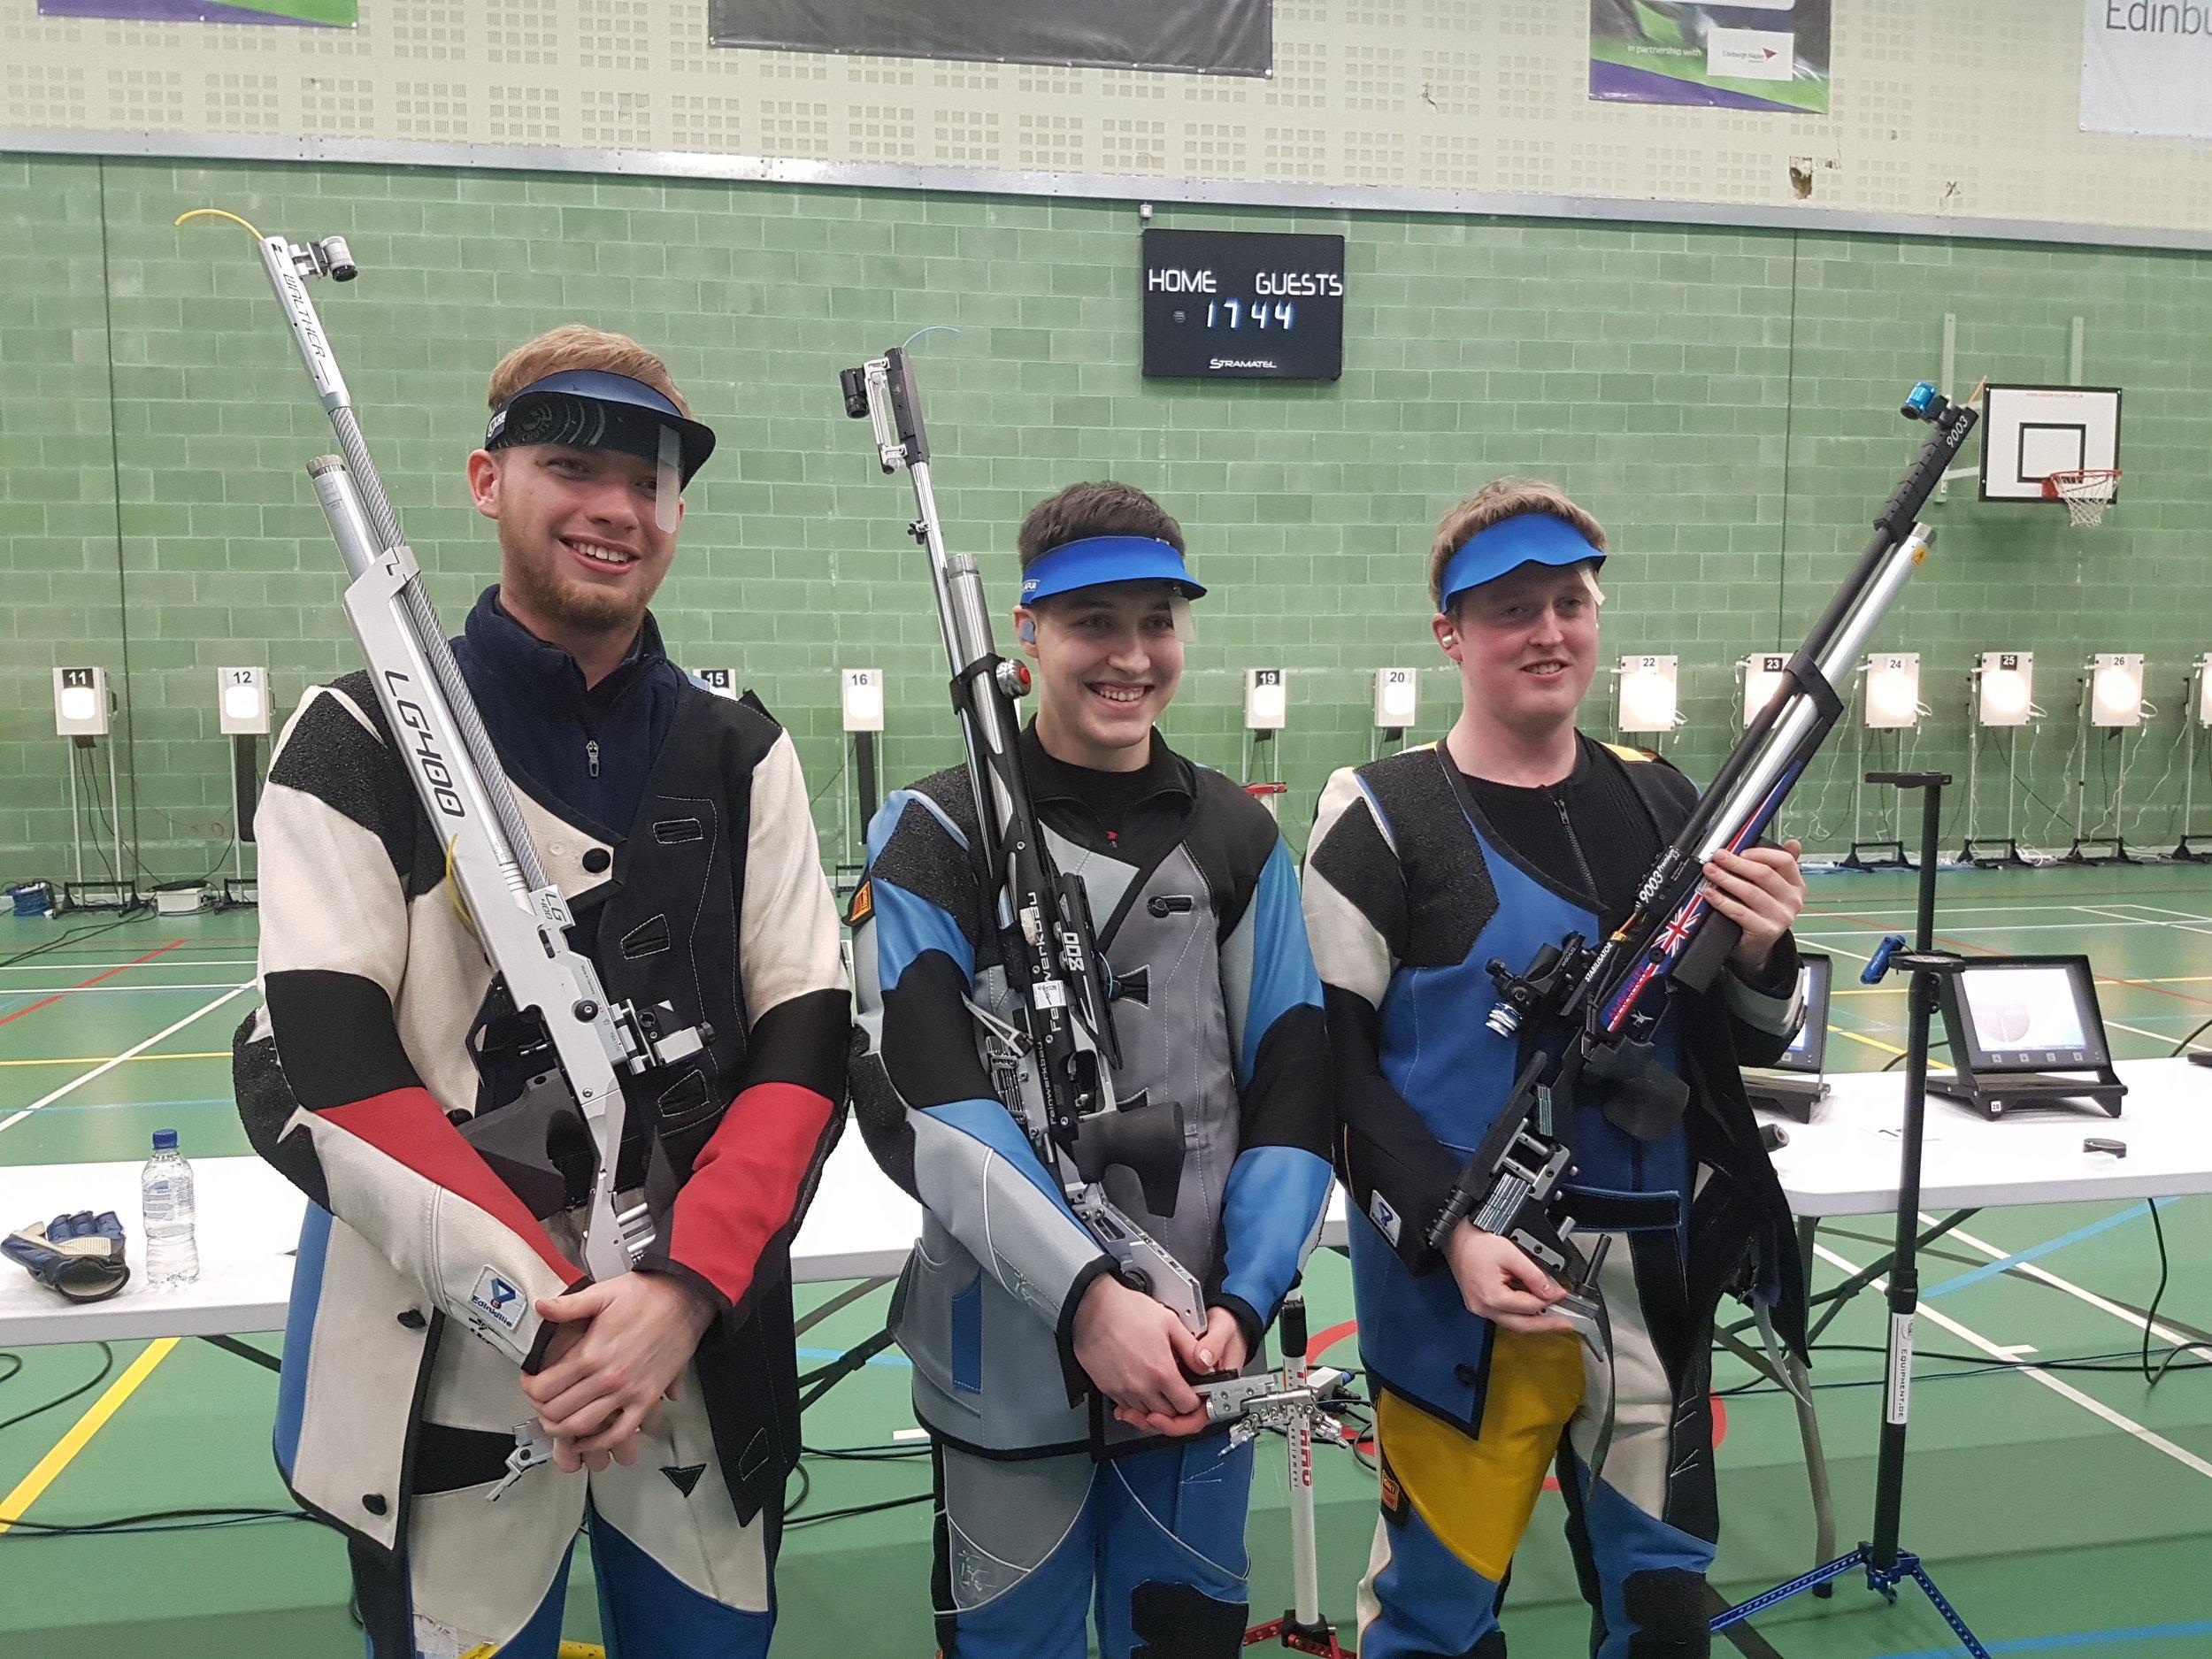 Winners - Men's Junior 10m Air Rifle Championships